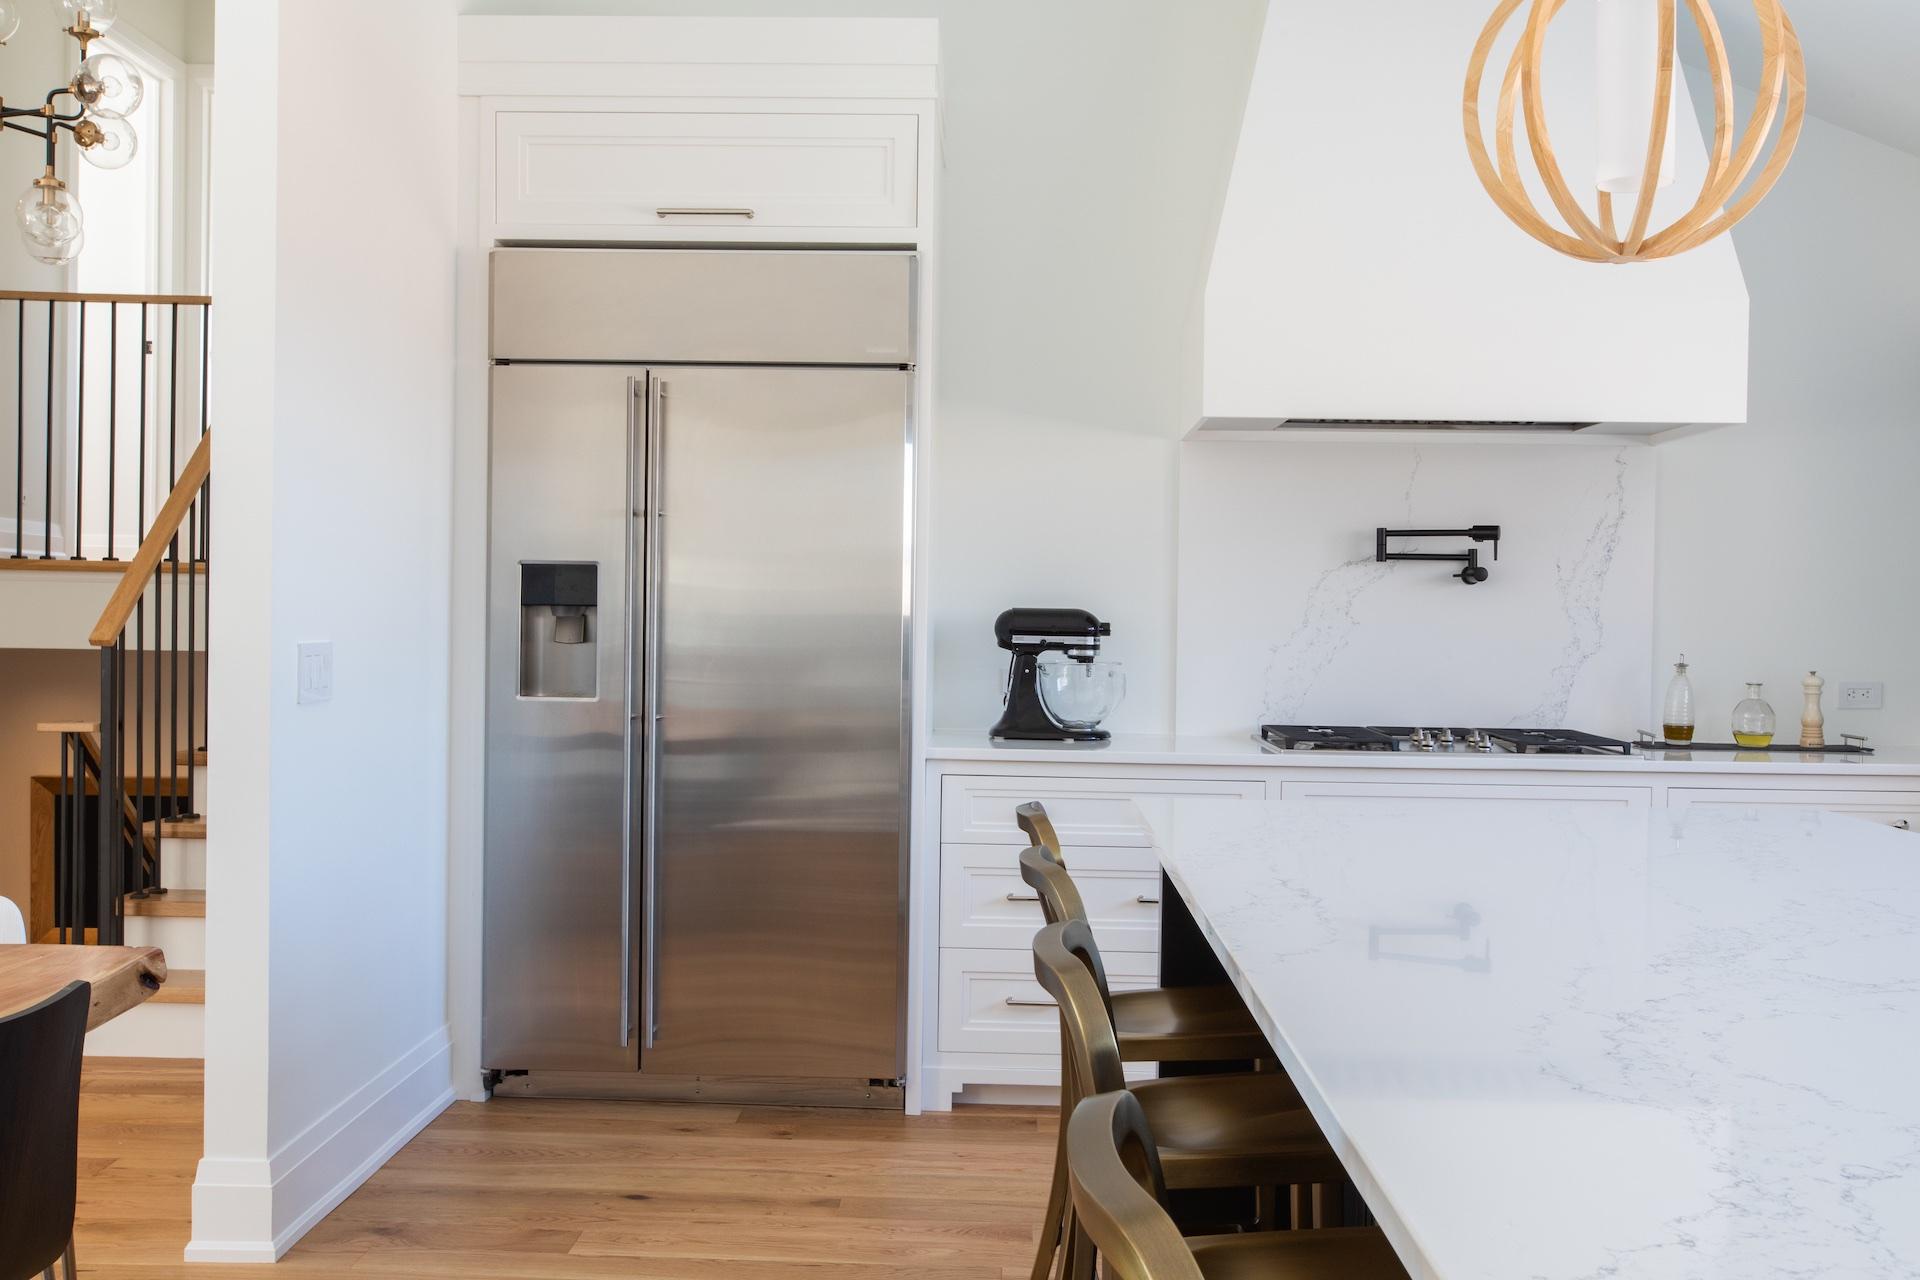 Kitchen fridge and stove